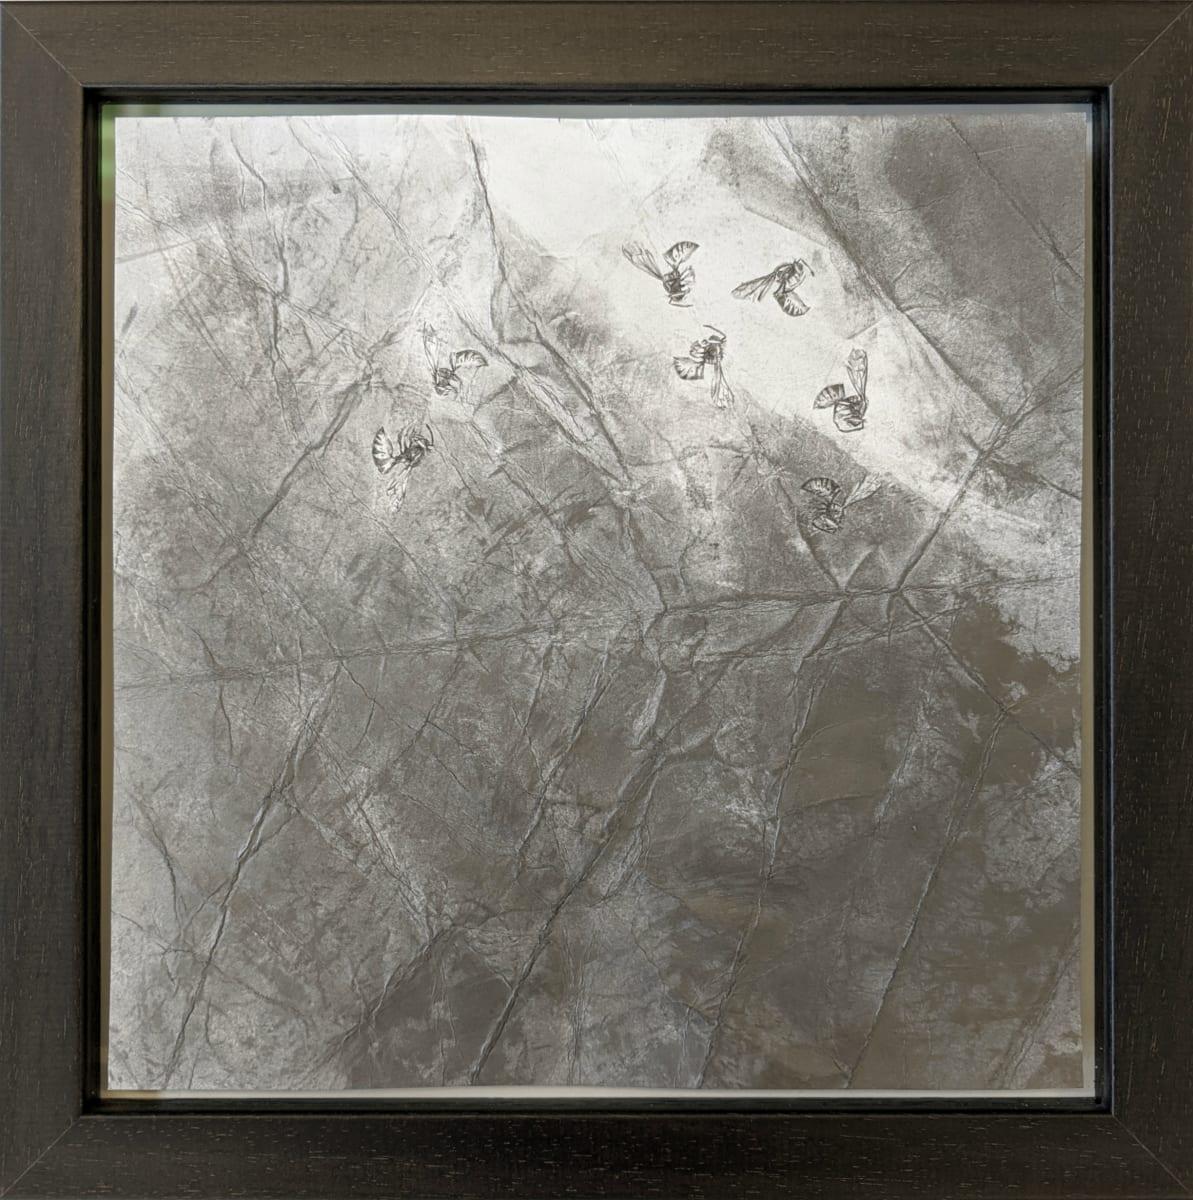 FlightPath lvi by Louisa Crispin